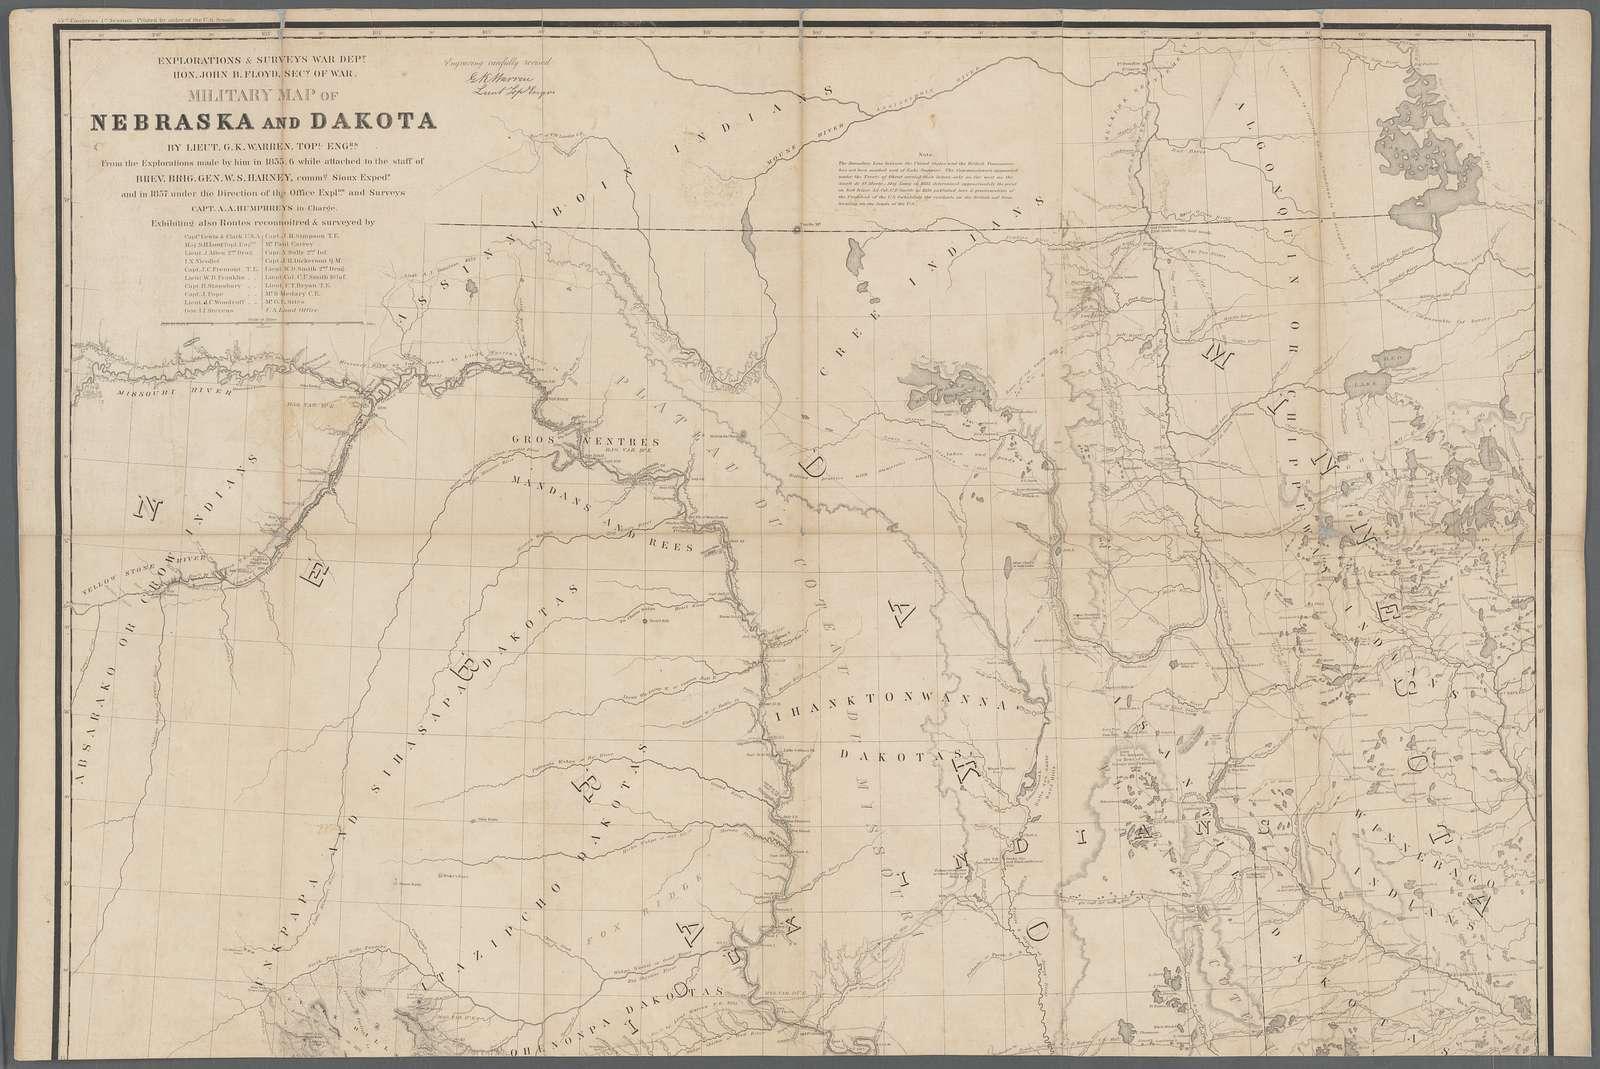 Military map of Nebraska and Dakota